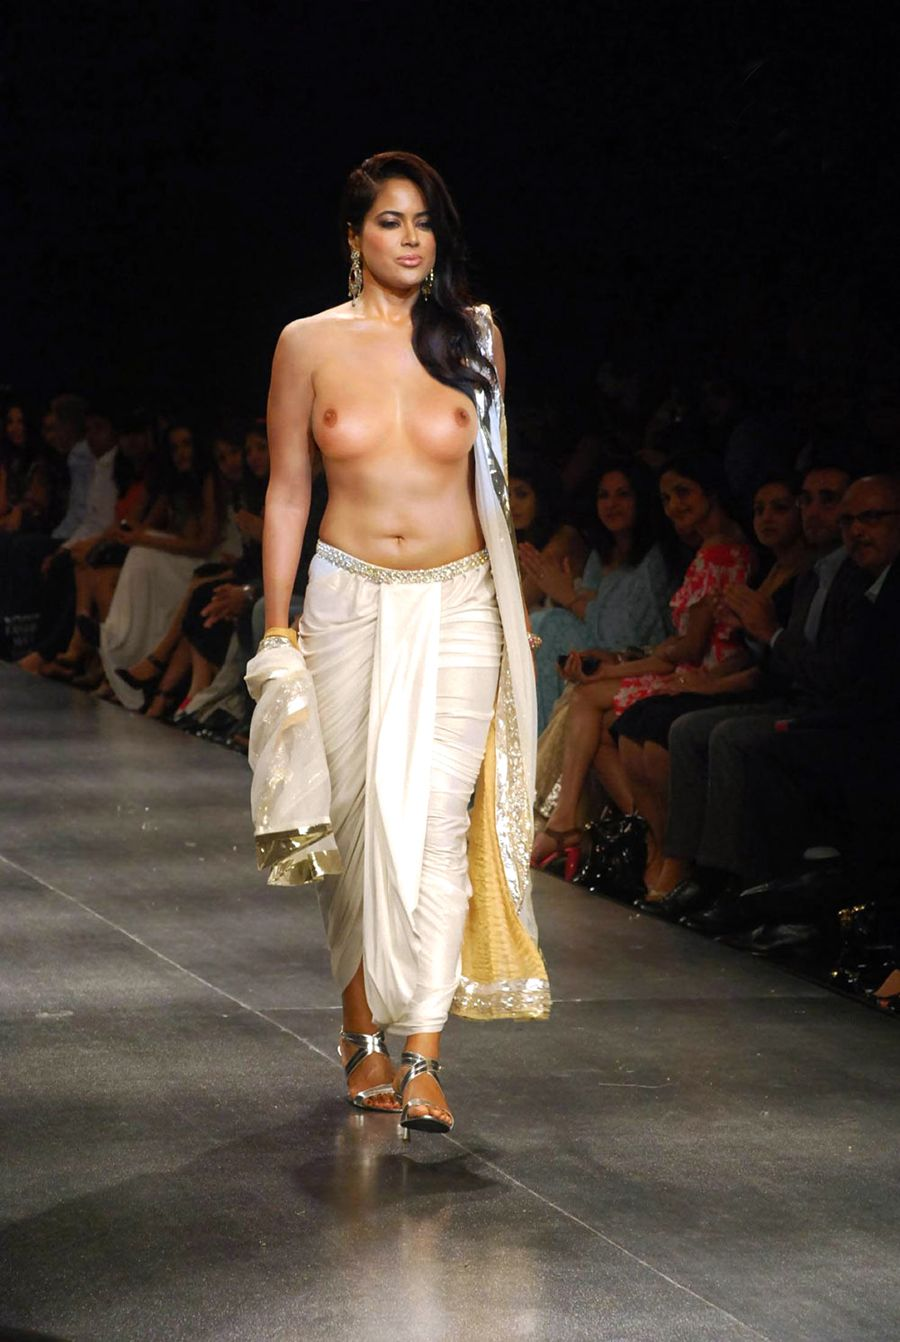 Pic Nude india runway